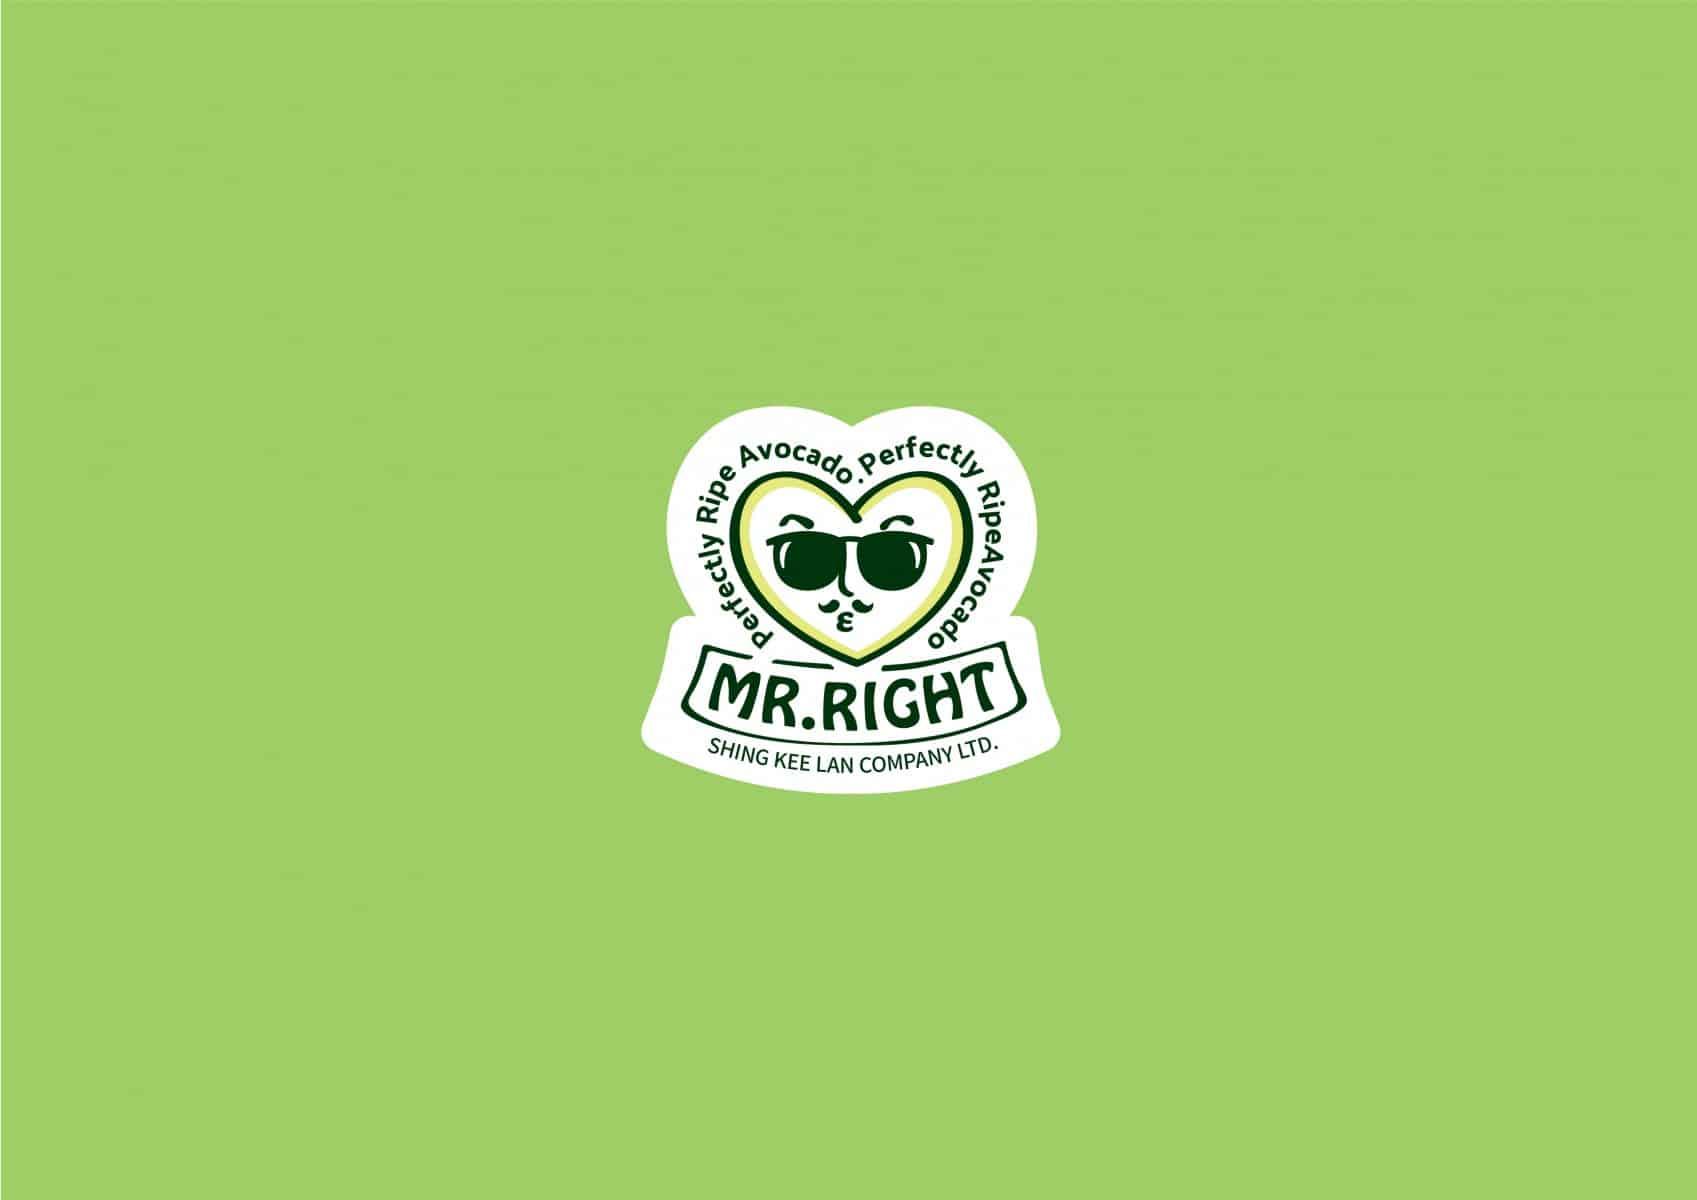 Mr. Right | Perfectly Ripe Avocado | Branding design